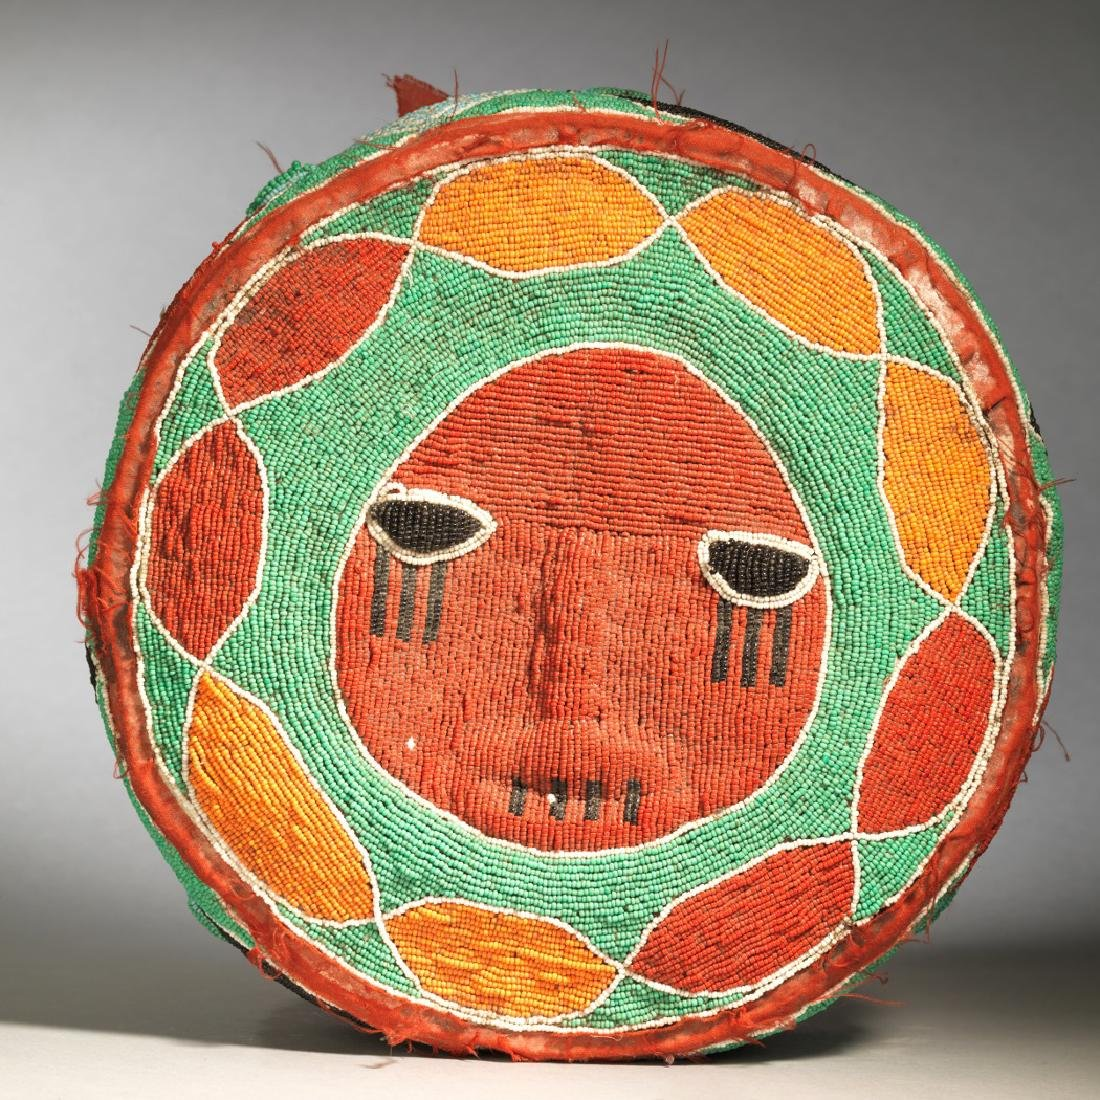 Yoruba Royal Foot Cushion Tribal Art